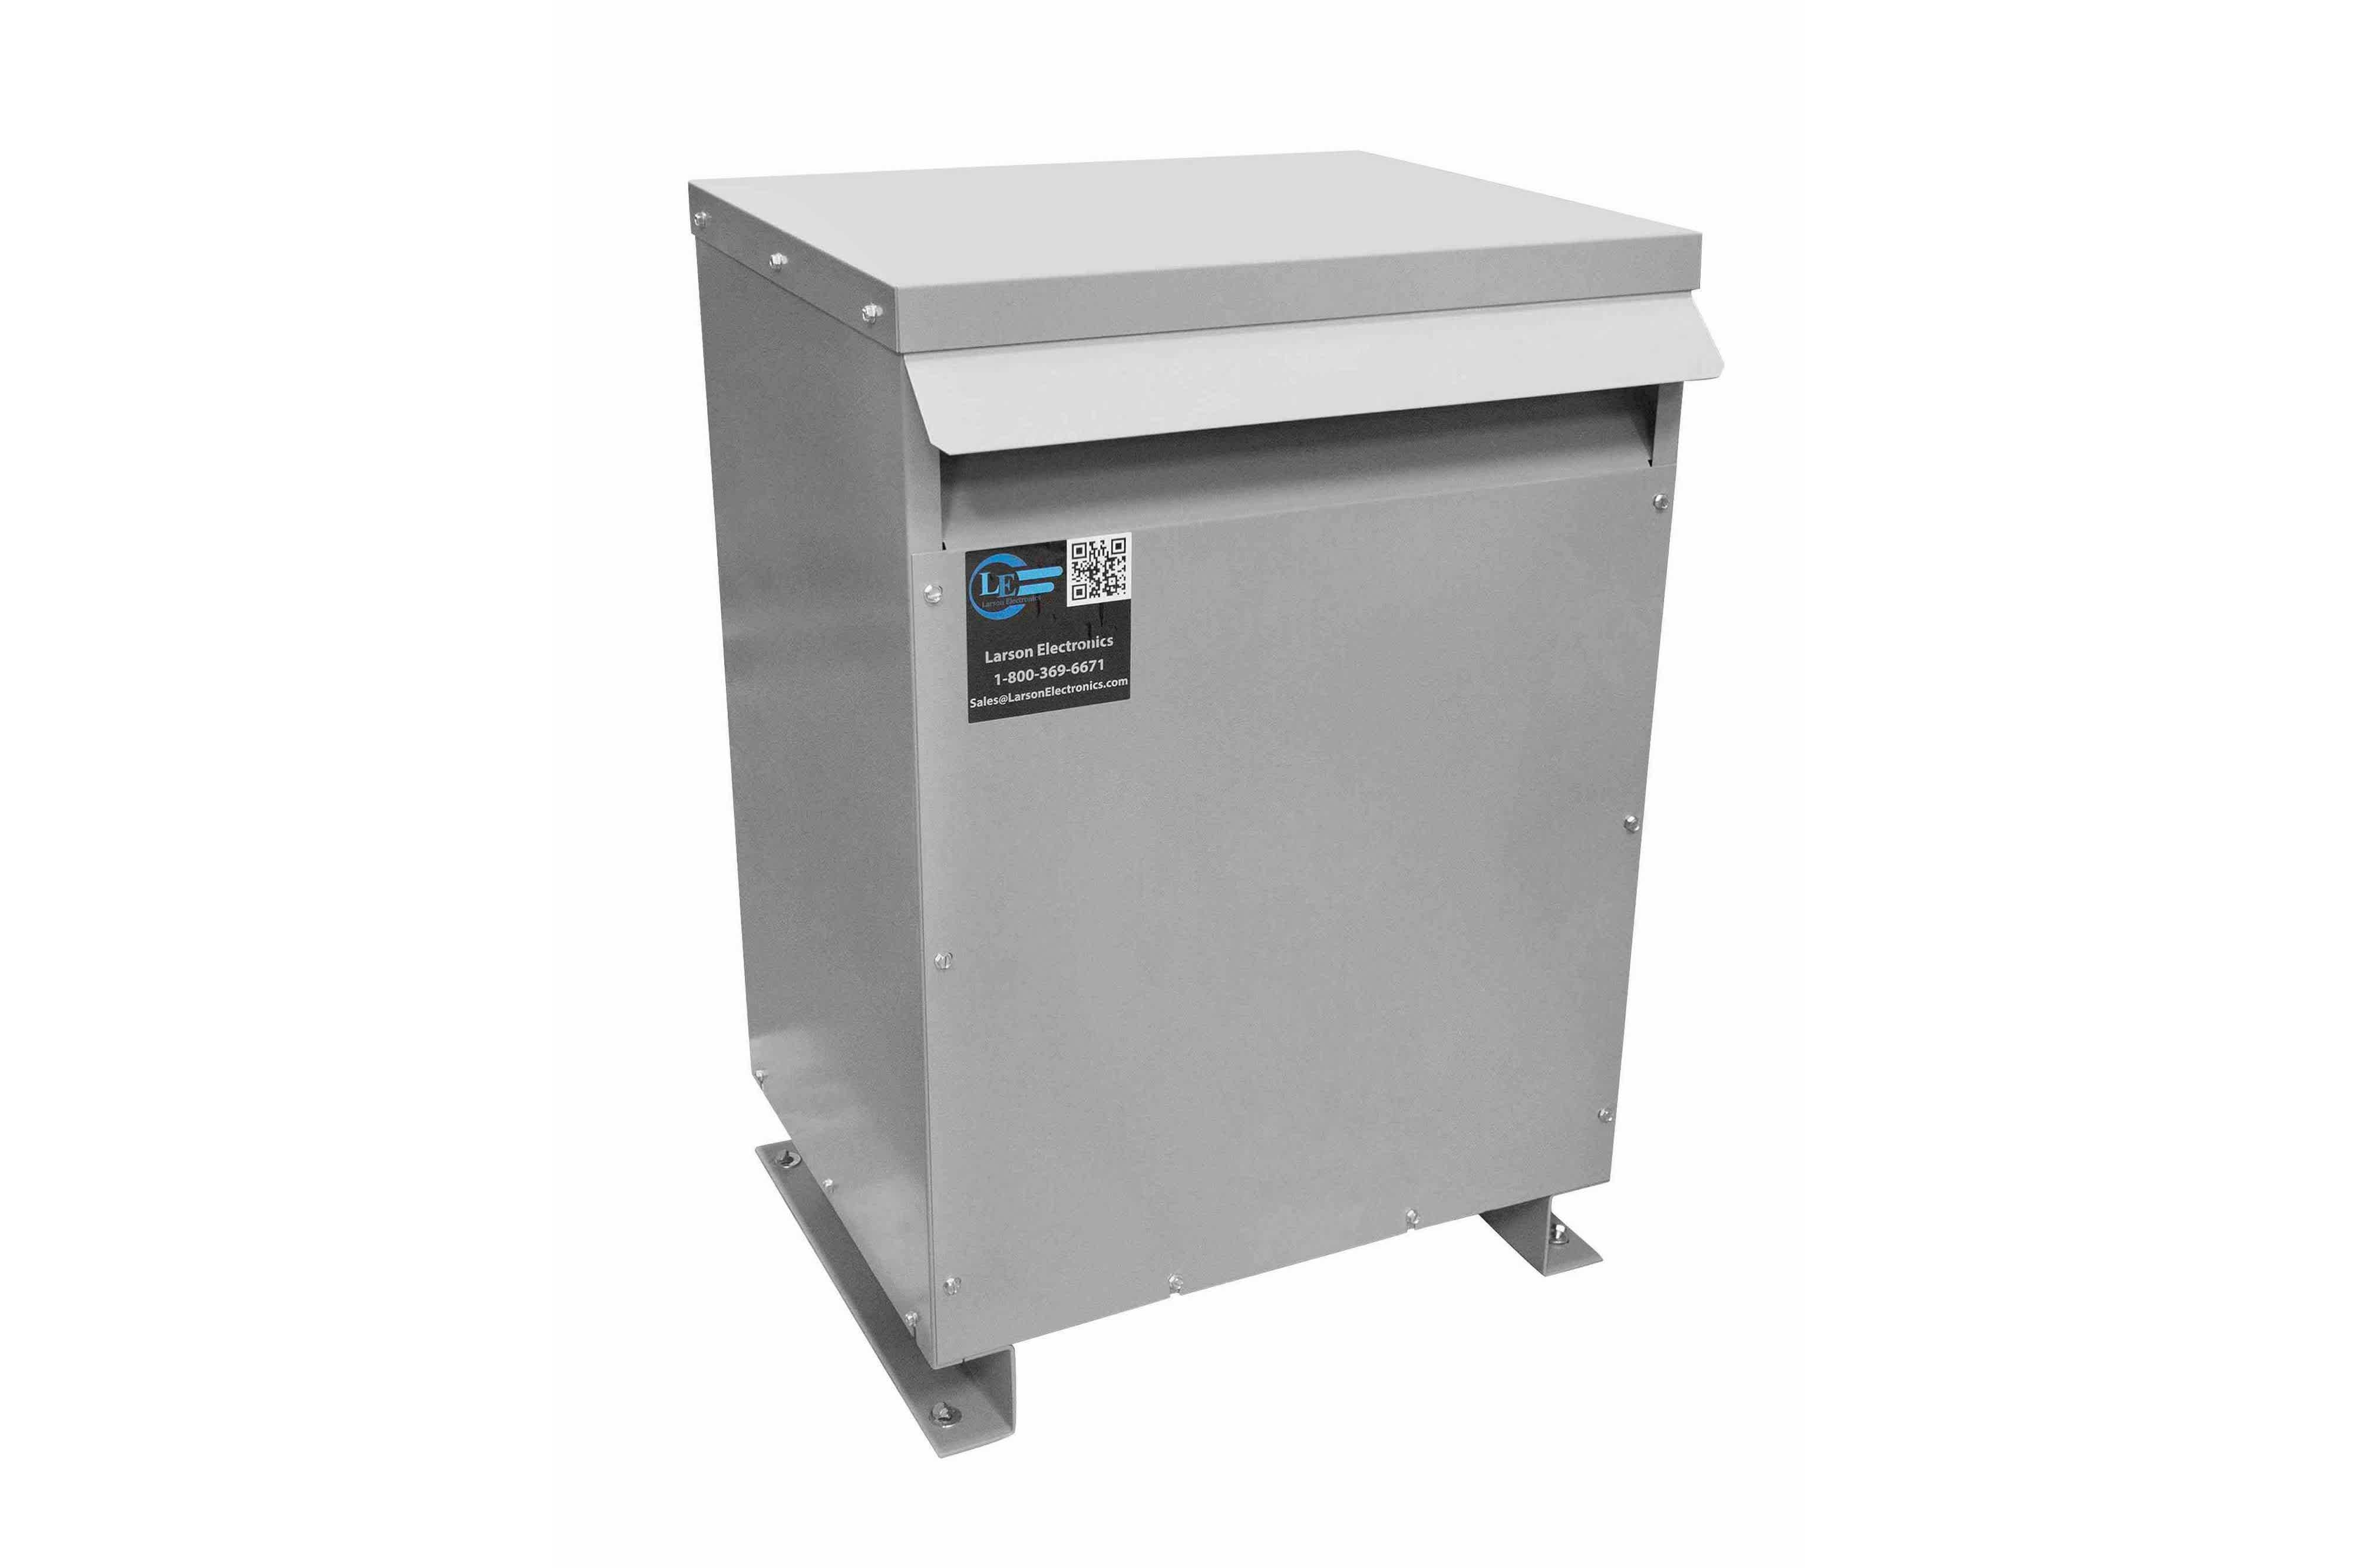 35 kVA 3PH Isolation Transformer, 220V Wye Primary, 480V Delta Secondary, N3R, Ventilated, 60 Hz